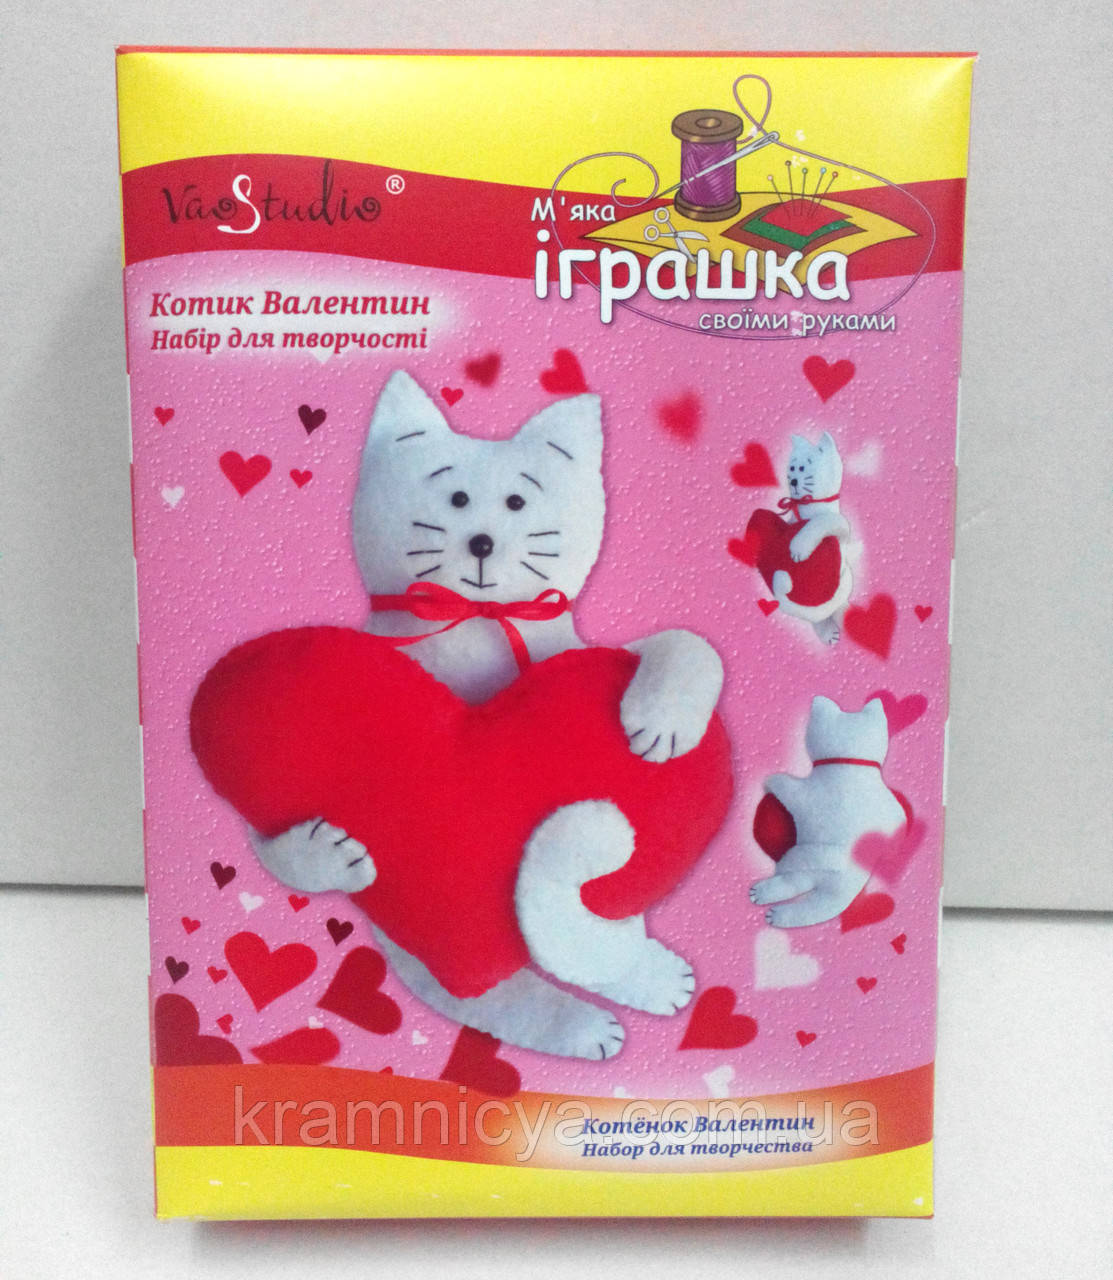 Набор для творчества 'Котик Валентин', серия Мягкая игрушкa